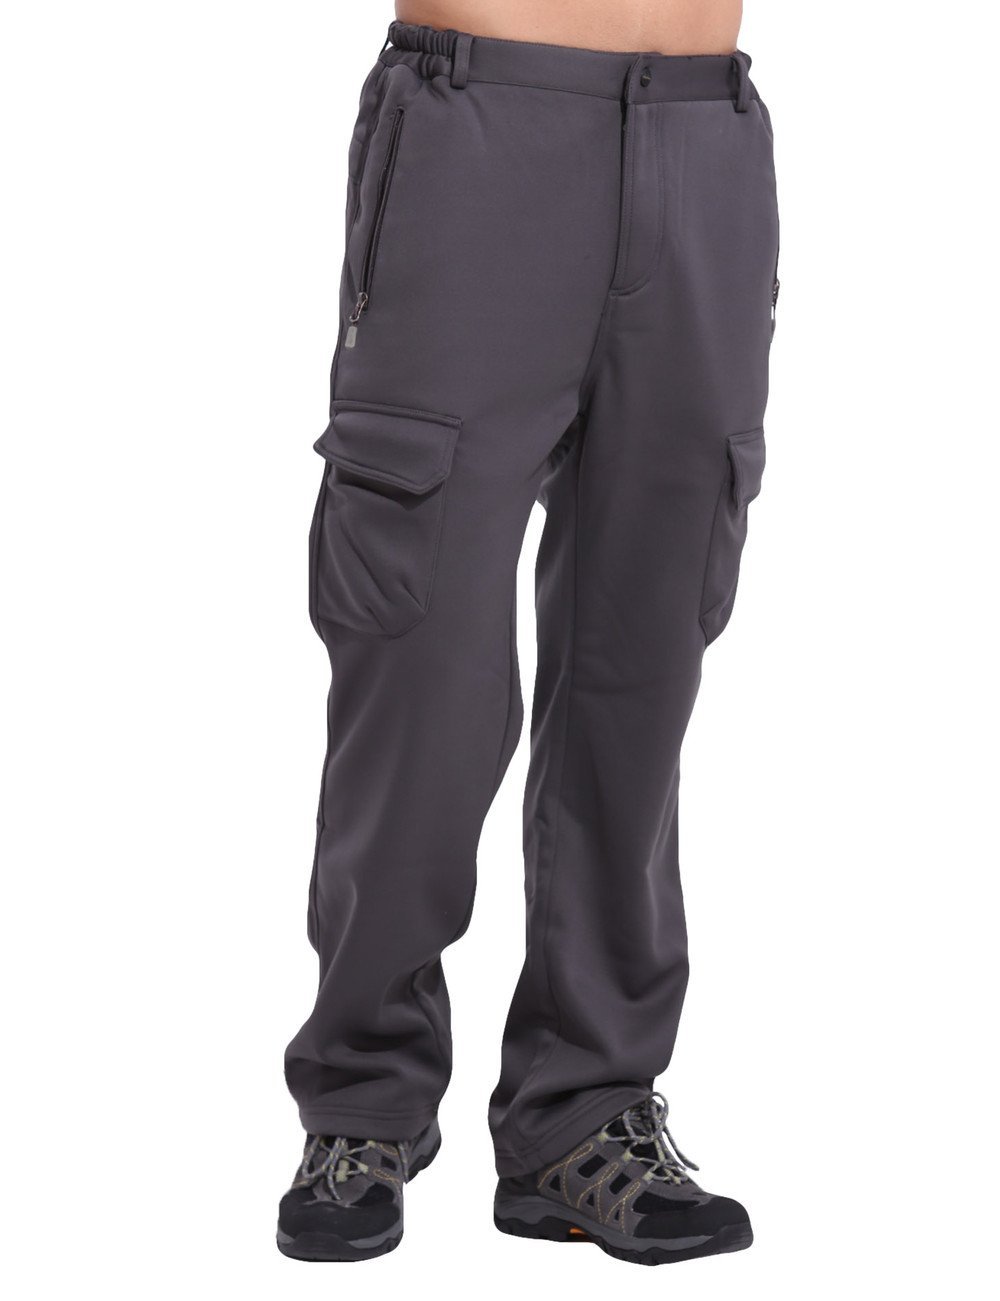 Clothin Men's Thicken Waterproof Fleece Lined Warm Ski Soft Shell Pants new winter fleece lined unisex hiking pants men windbreaker waterproof hunting climbing softshell pants ladies slim fit trousers